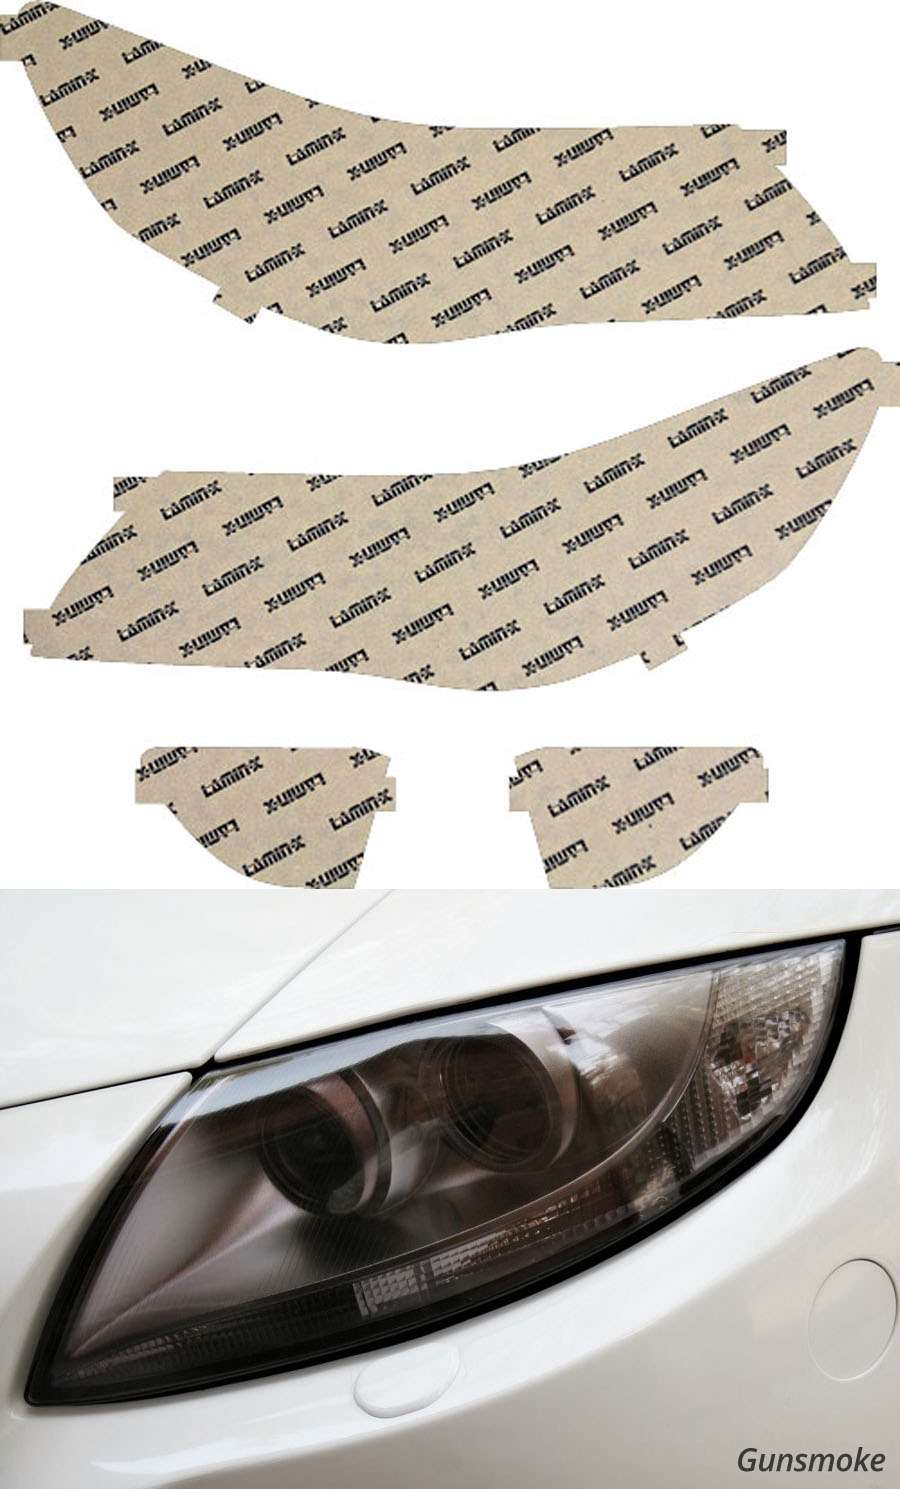 Acura RL 09-12 Gunsmoke Headlight Covers Lamin-X AC020G